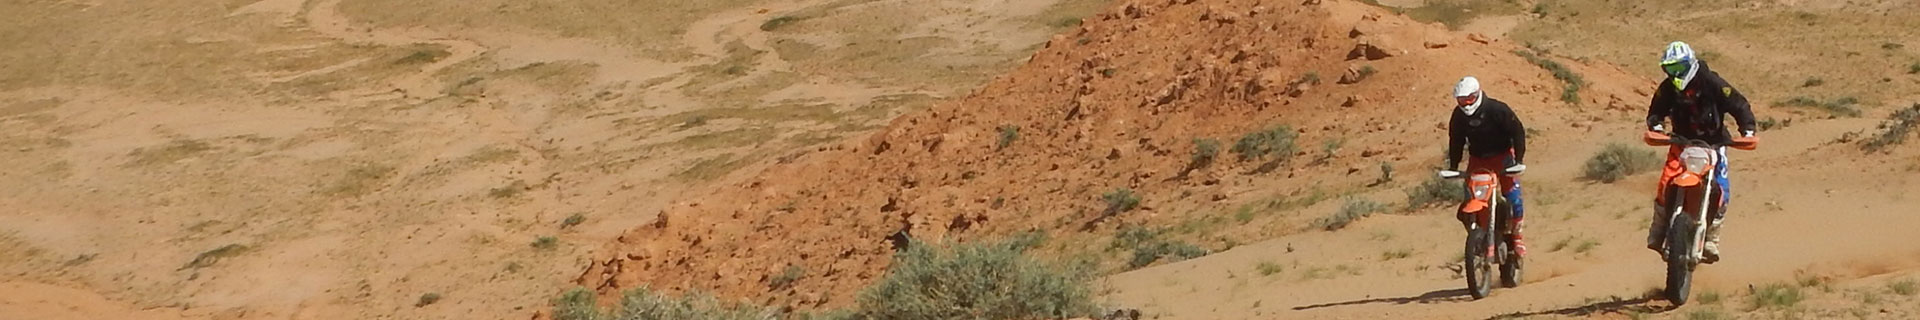 mongolei-enduro-reise-slider-15